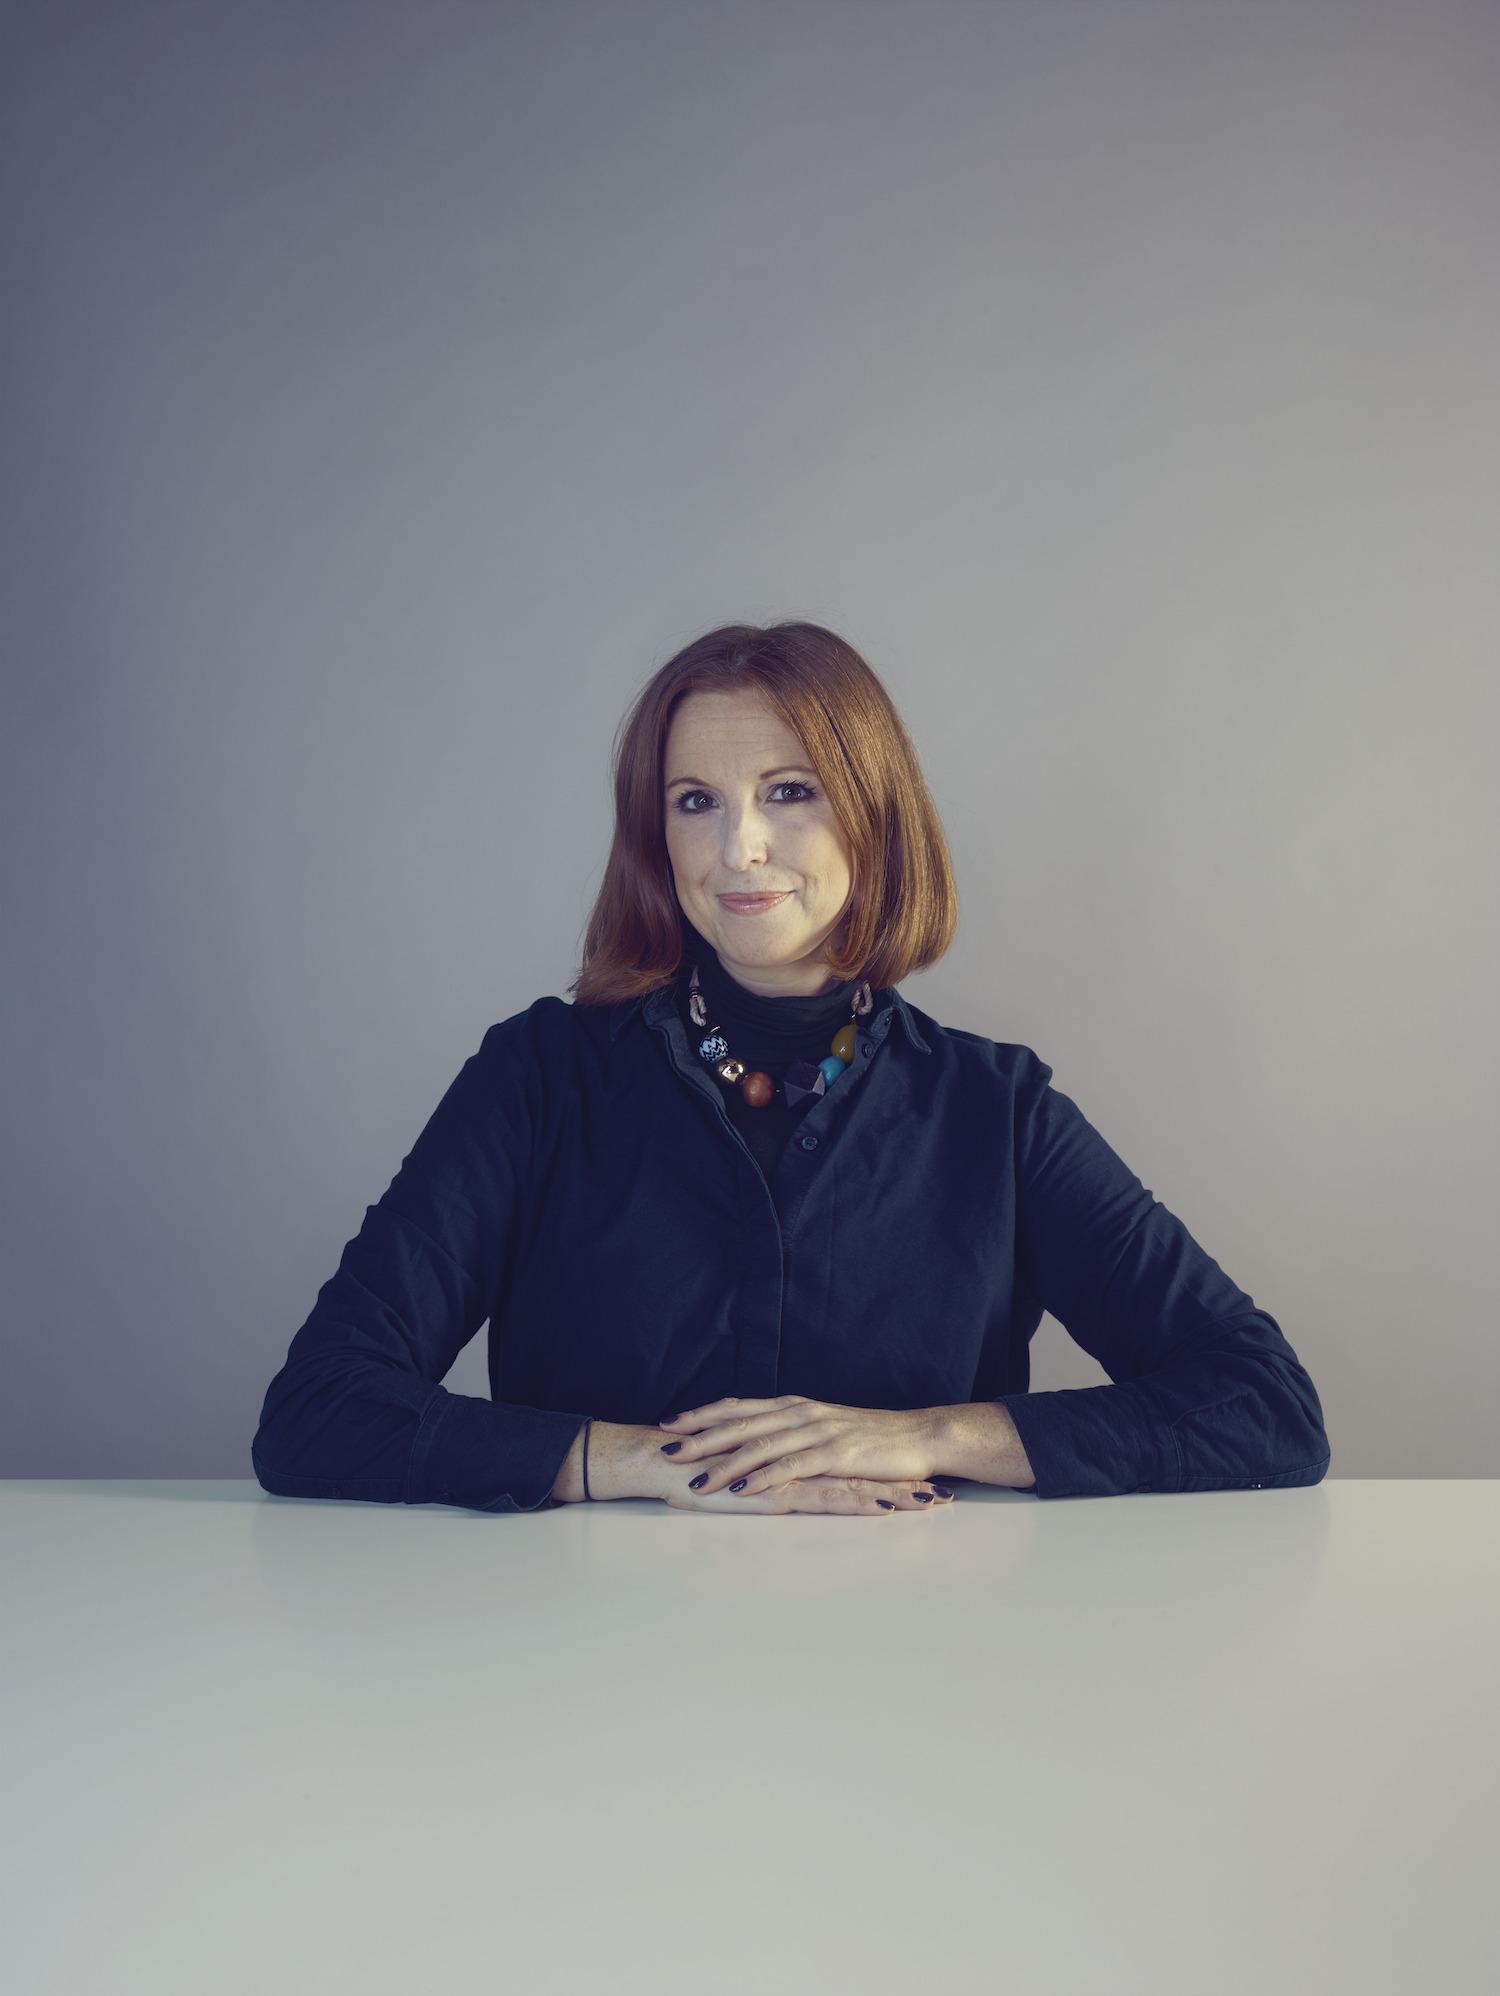 GLOBAL HEADLINE MAKERS: LAURA ROGERS (UK)#2